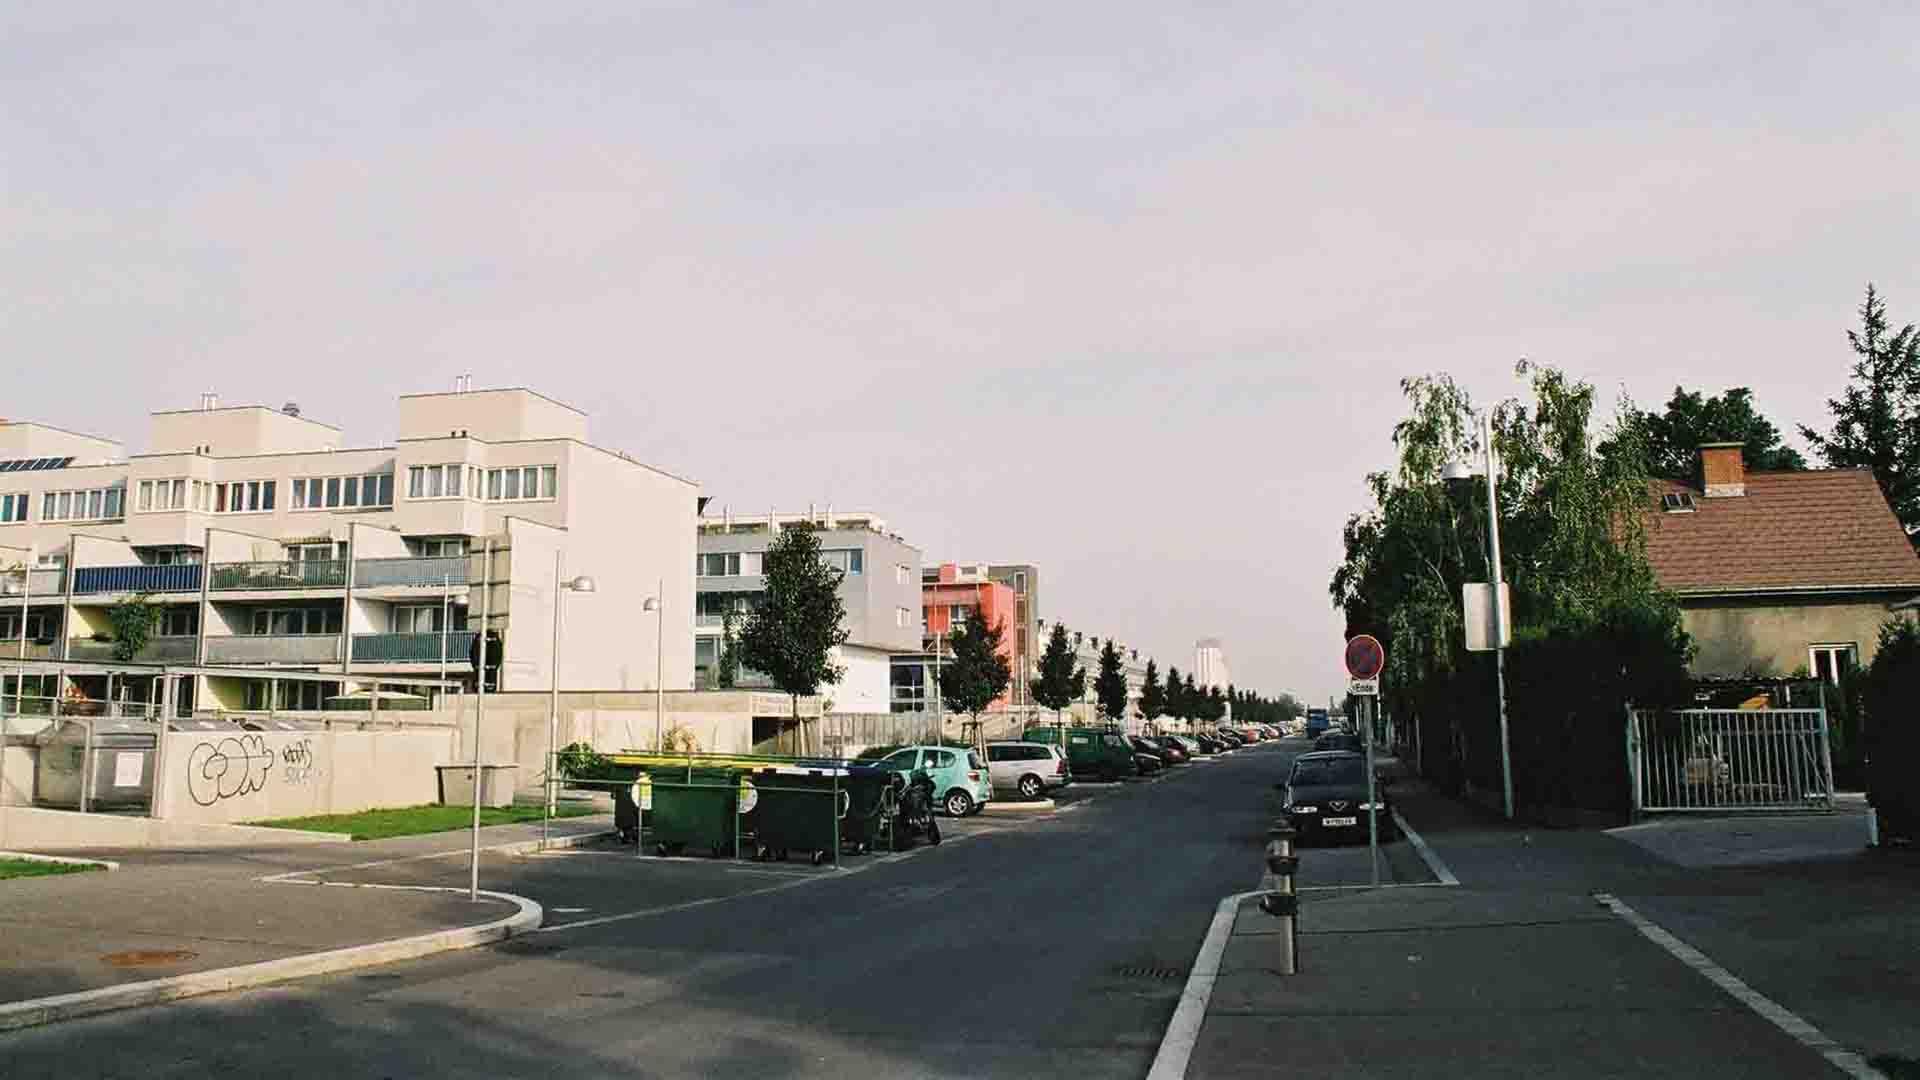 2a_PLAYstudio_Liesing area-Wien_2004